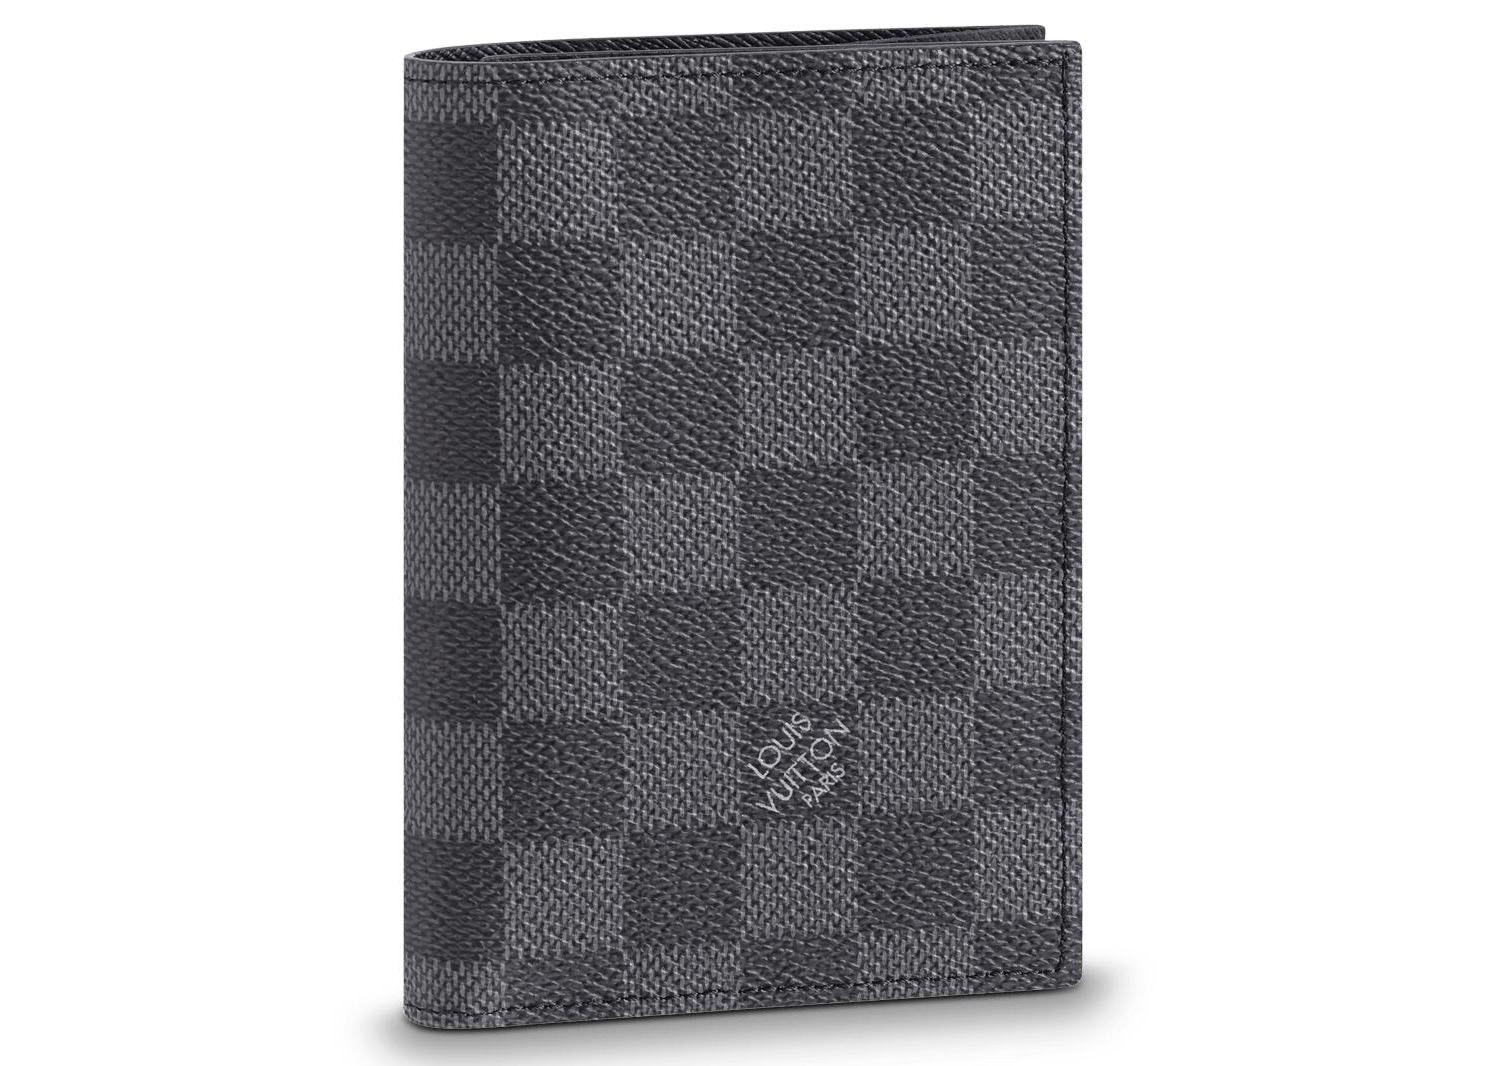 Louis Vuitton Passport Cover Damier Graphite Black/Gray